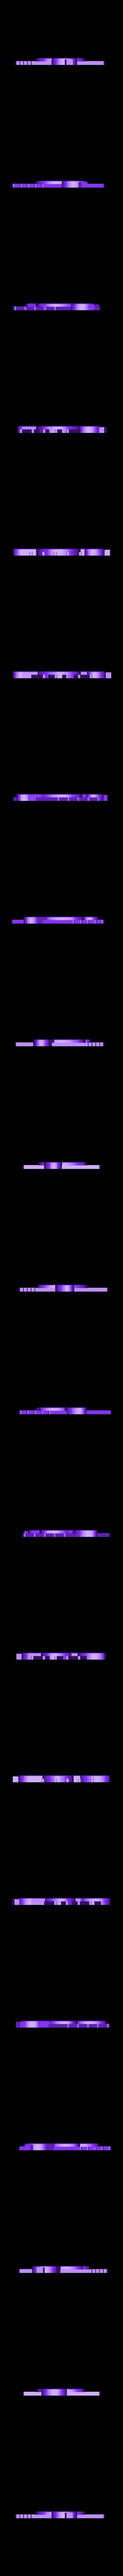 Pieza 1.STL Download STL file Key se Sol with base • 3D printable object, nldise